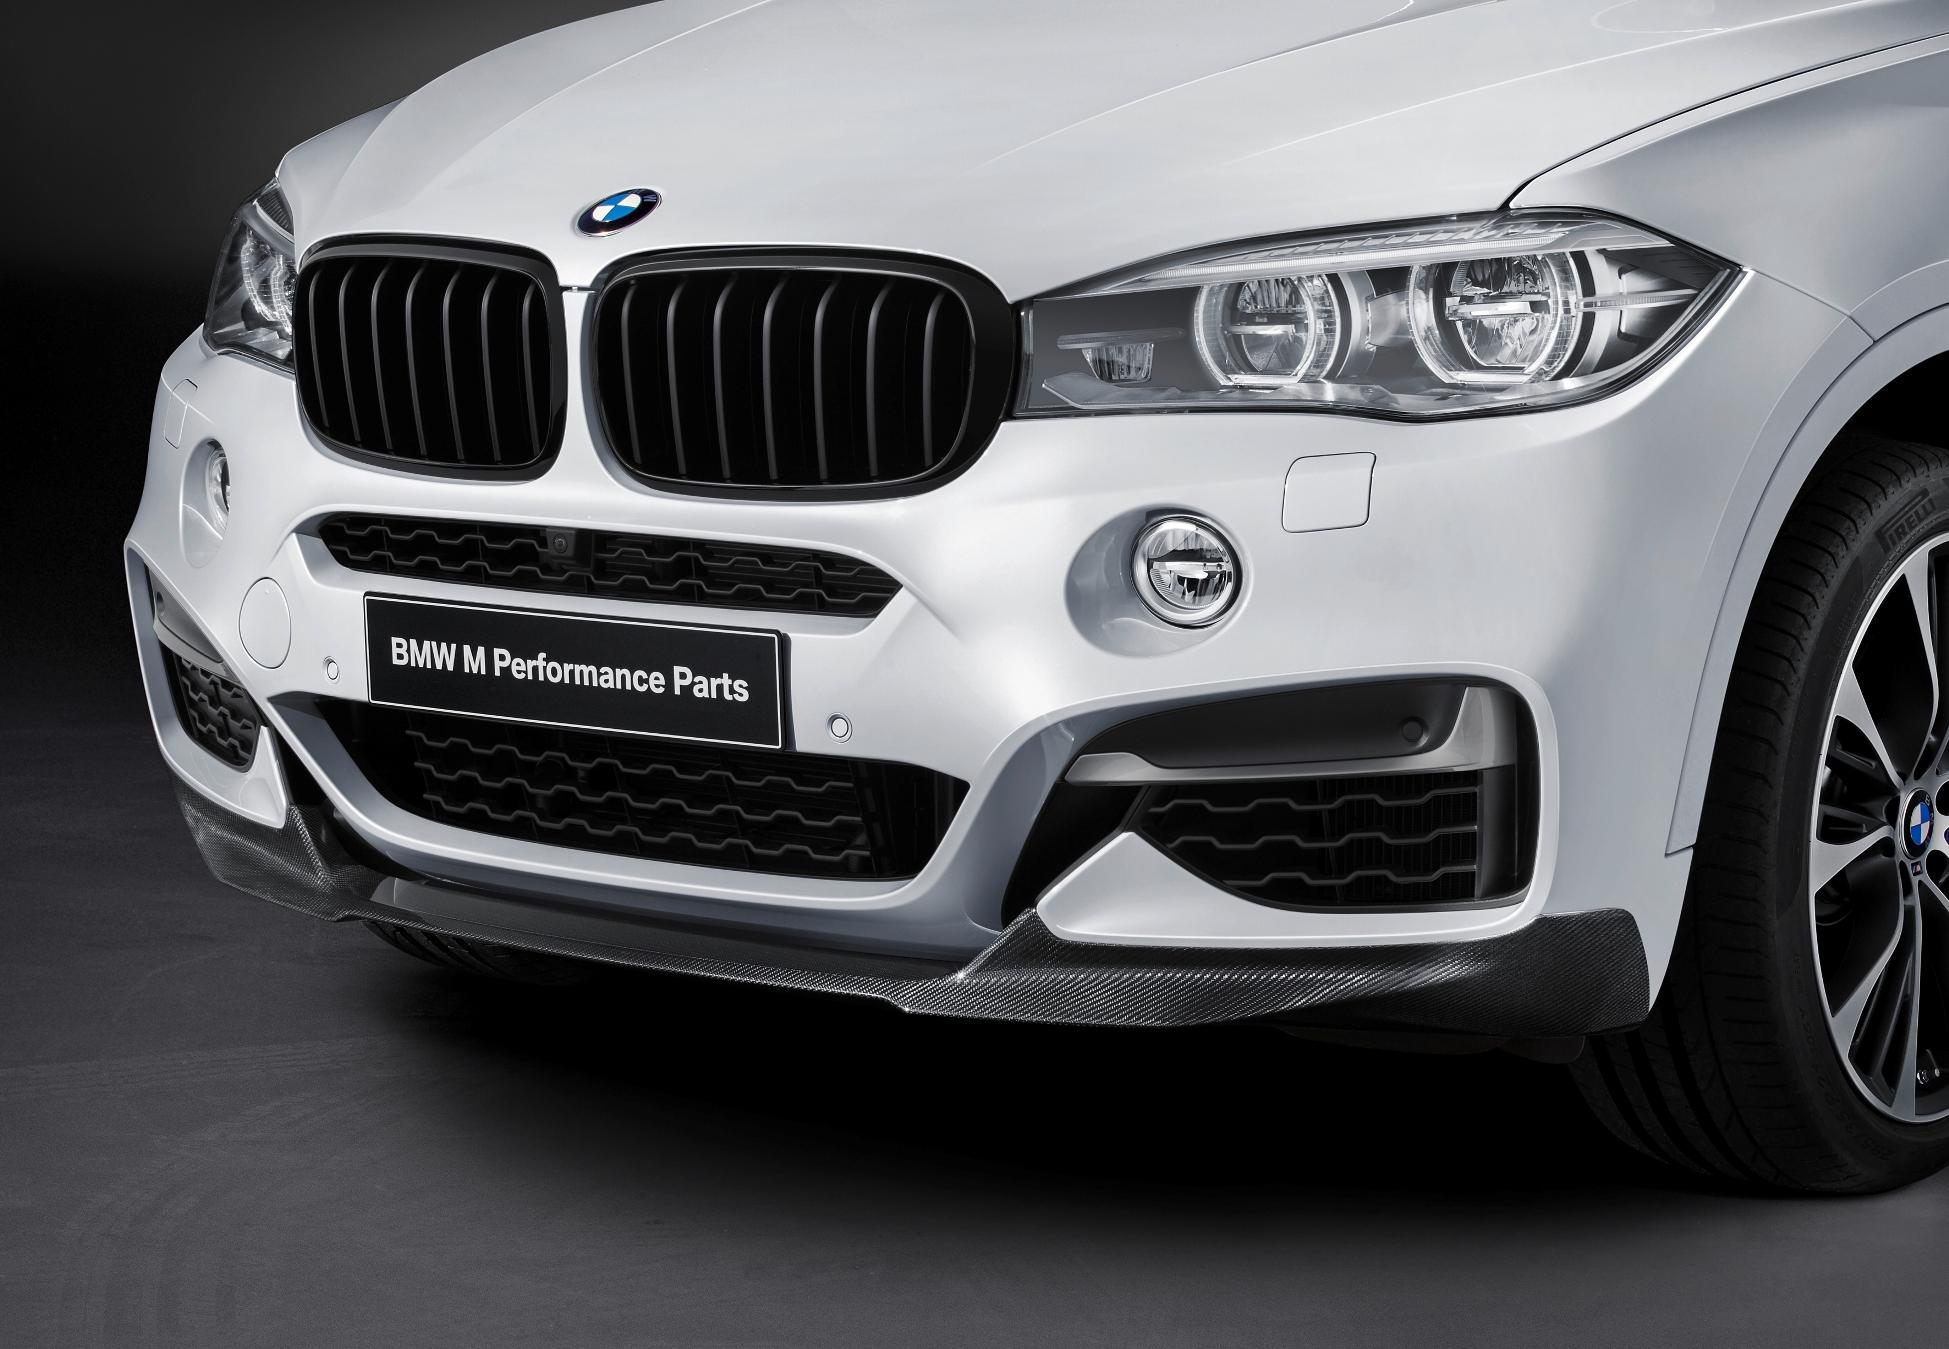 Noile componente BMW M Performance pentru BMW X6